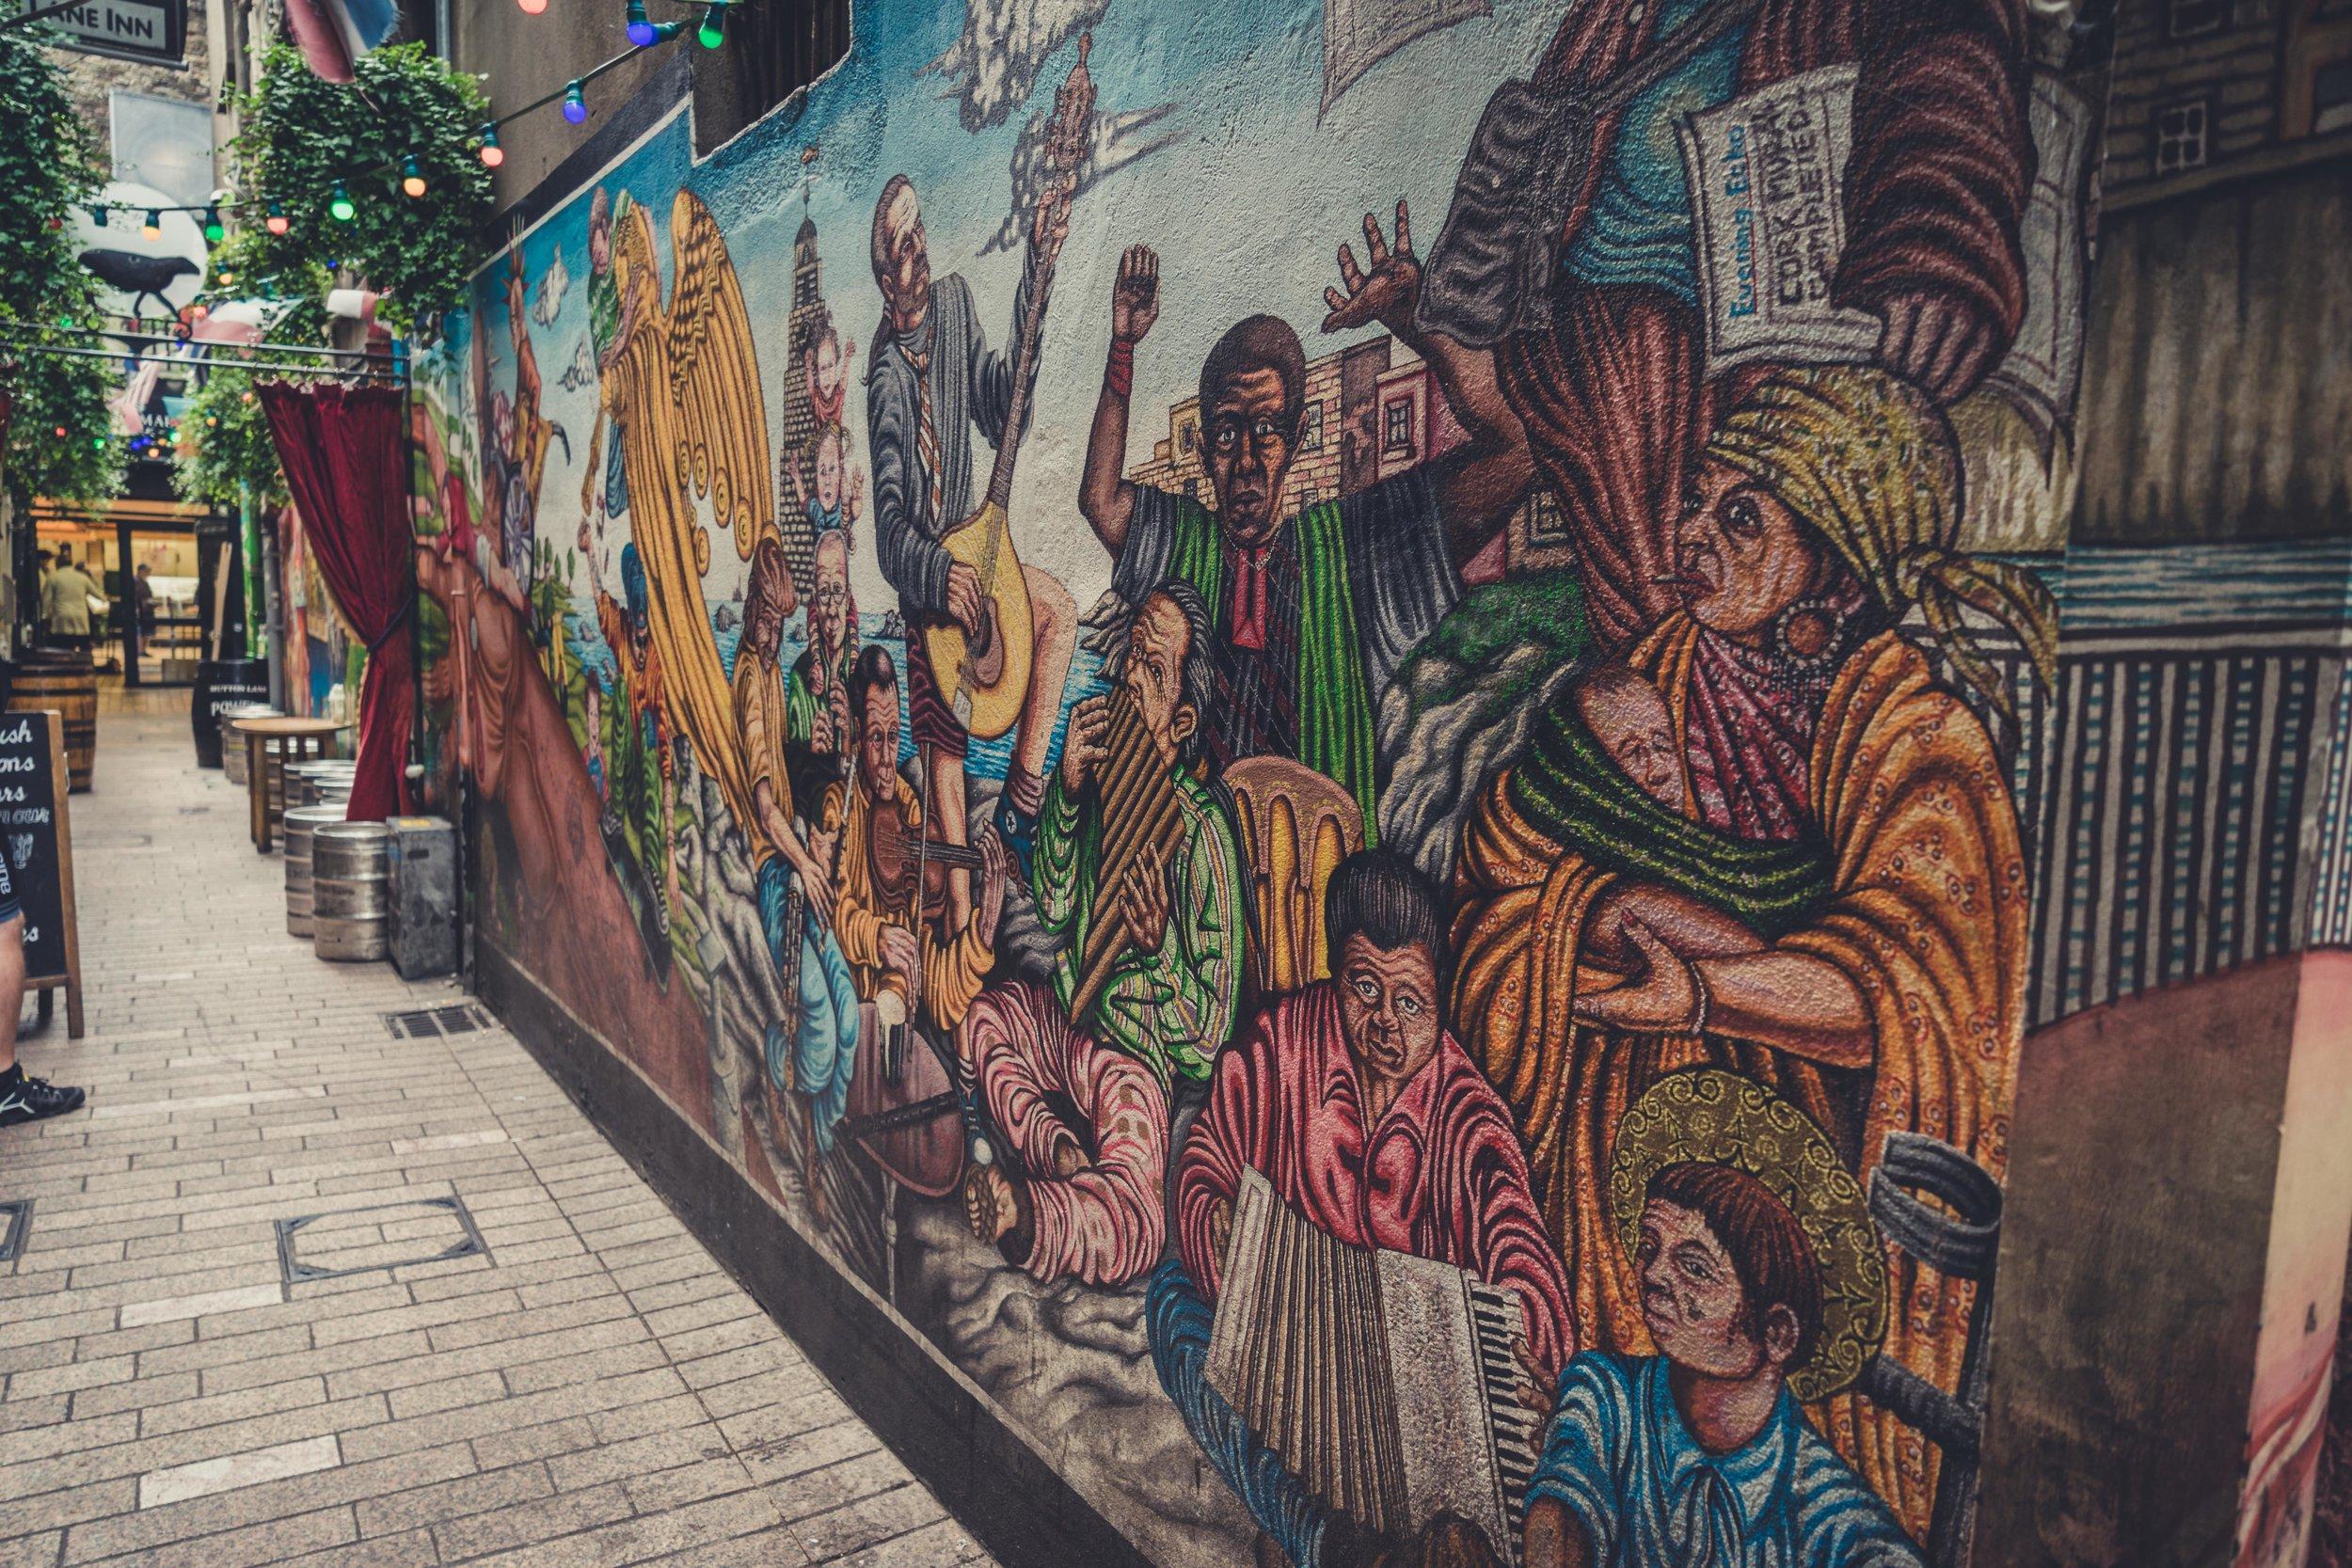 county cork. cork. ireland. irish. history. city. house sitting. old. travel. travel photography. travel photographer.  wall art on the walls.jpg